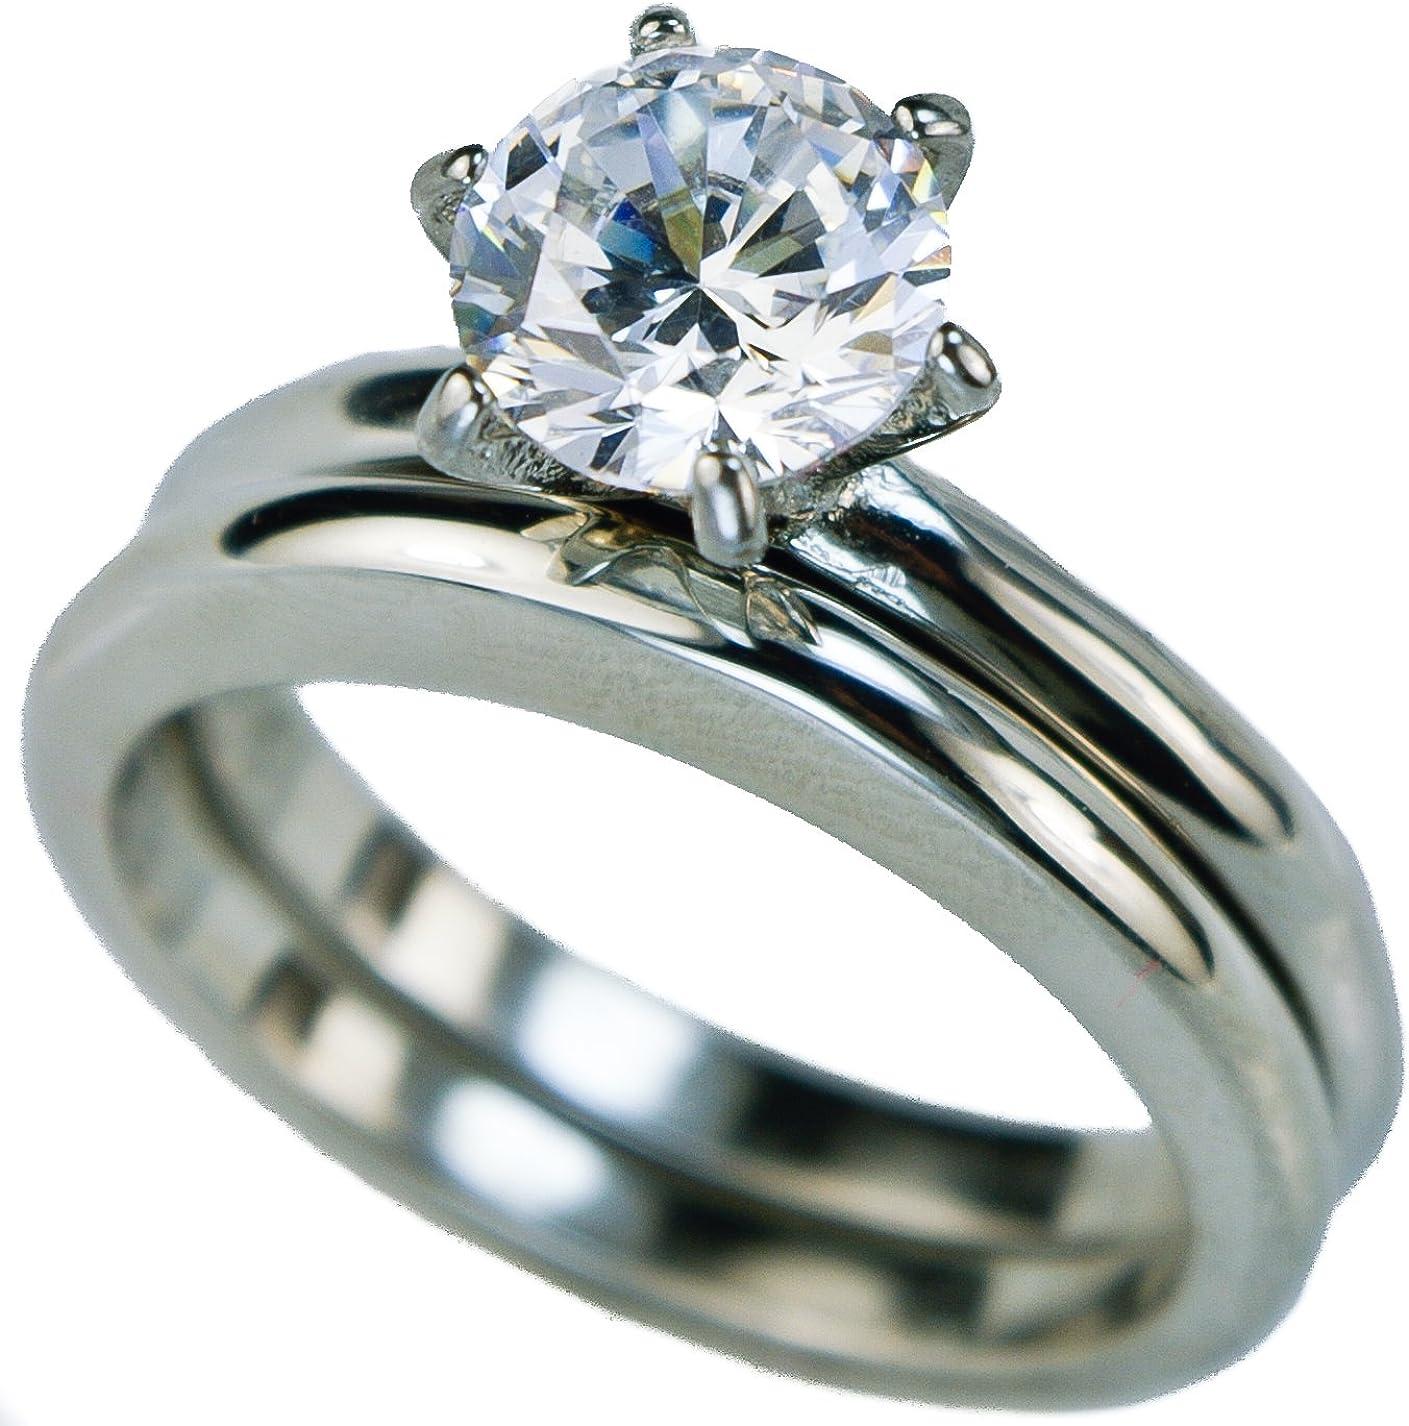 7 Gemini His /& Hers Groom /& Bridal Matching Titanium Anniversary Wedding Band Ring Set 6mm/&4mm Men Ring Size 11 Women Ring Size